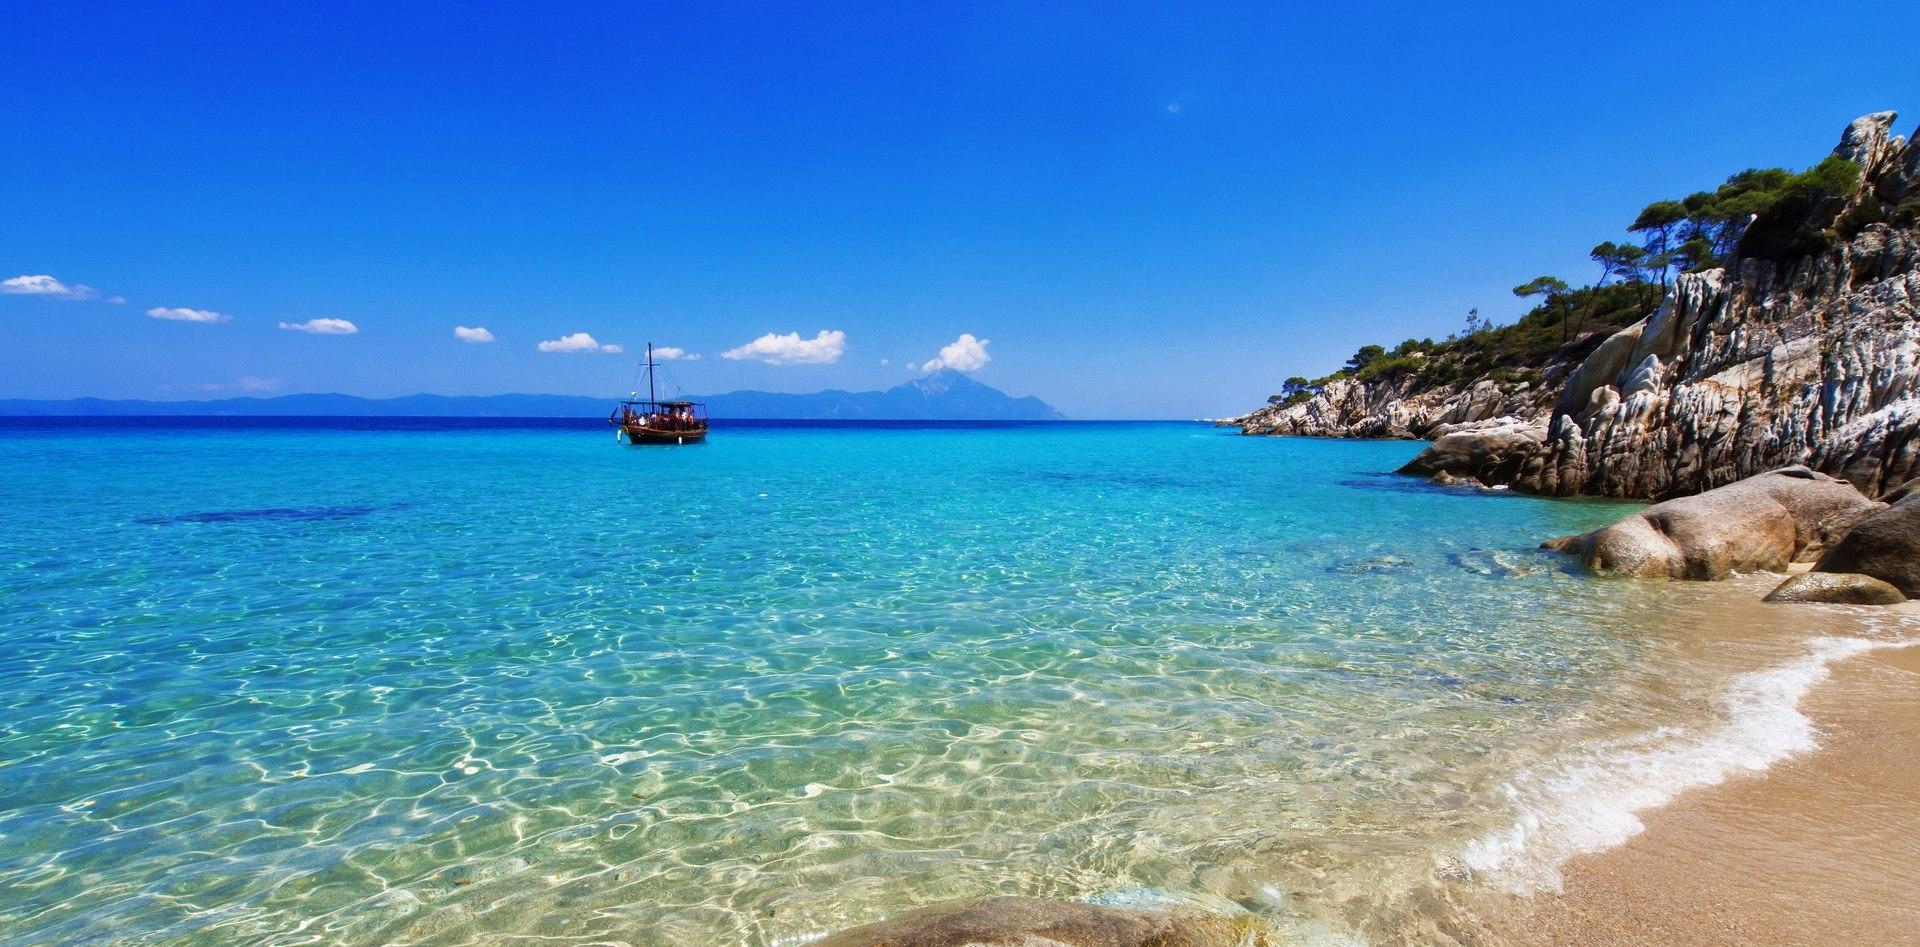 Hoteli Halkidiki online rezervacije - najniže cene